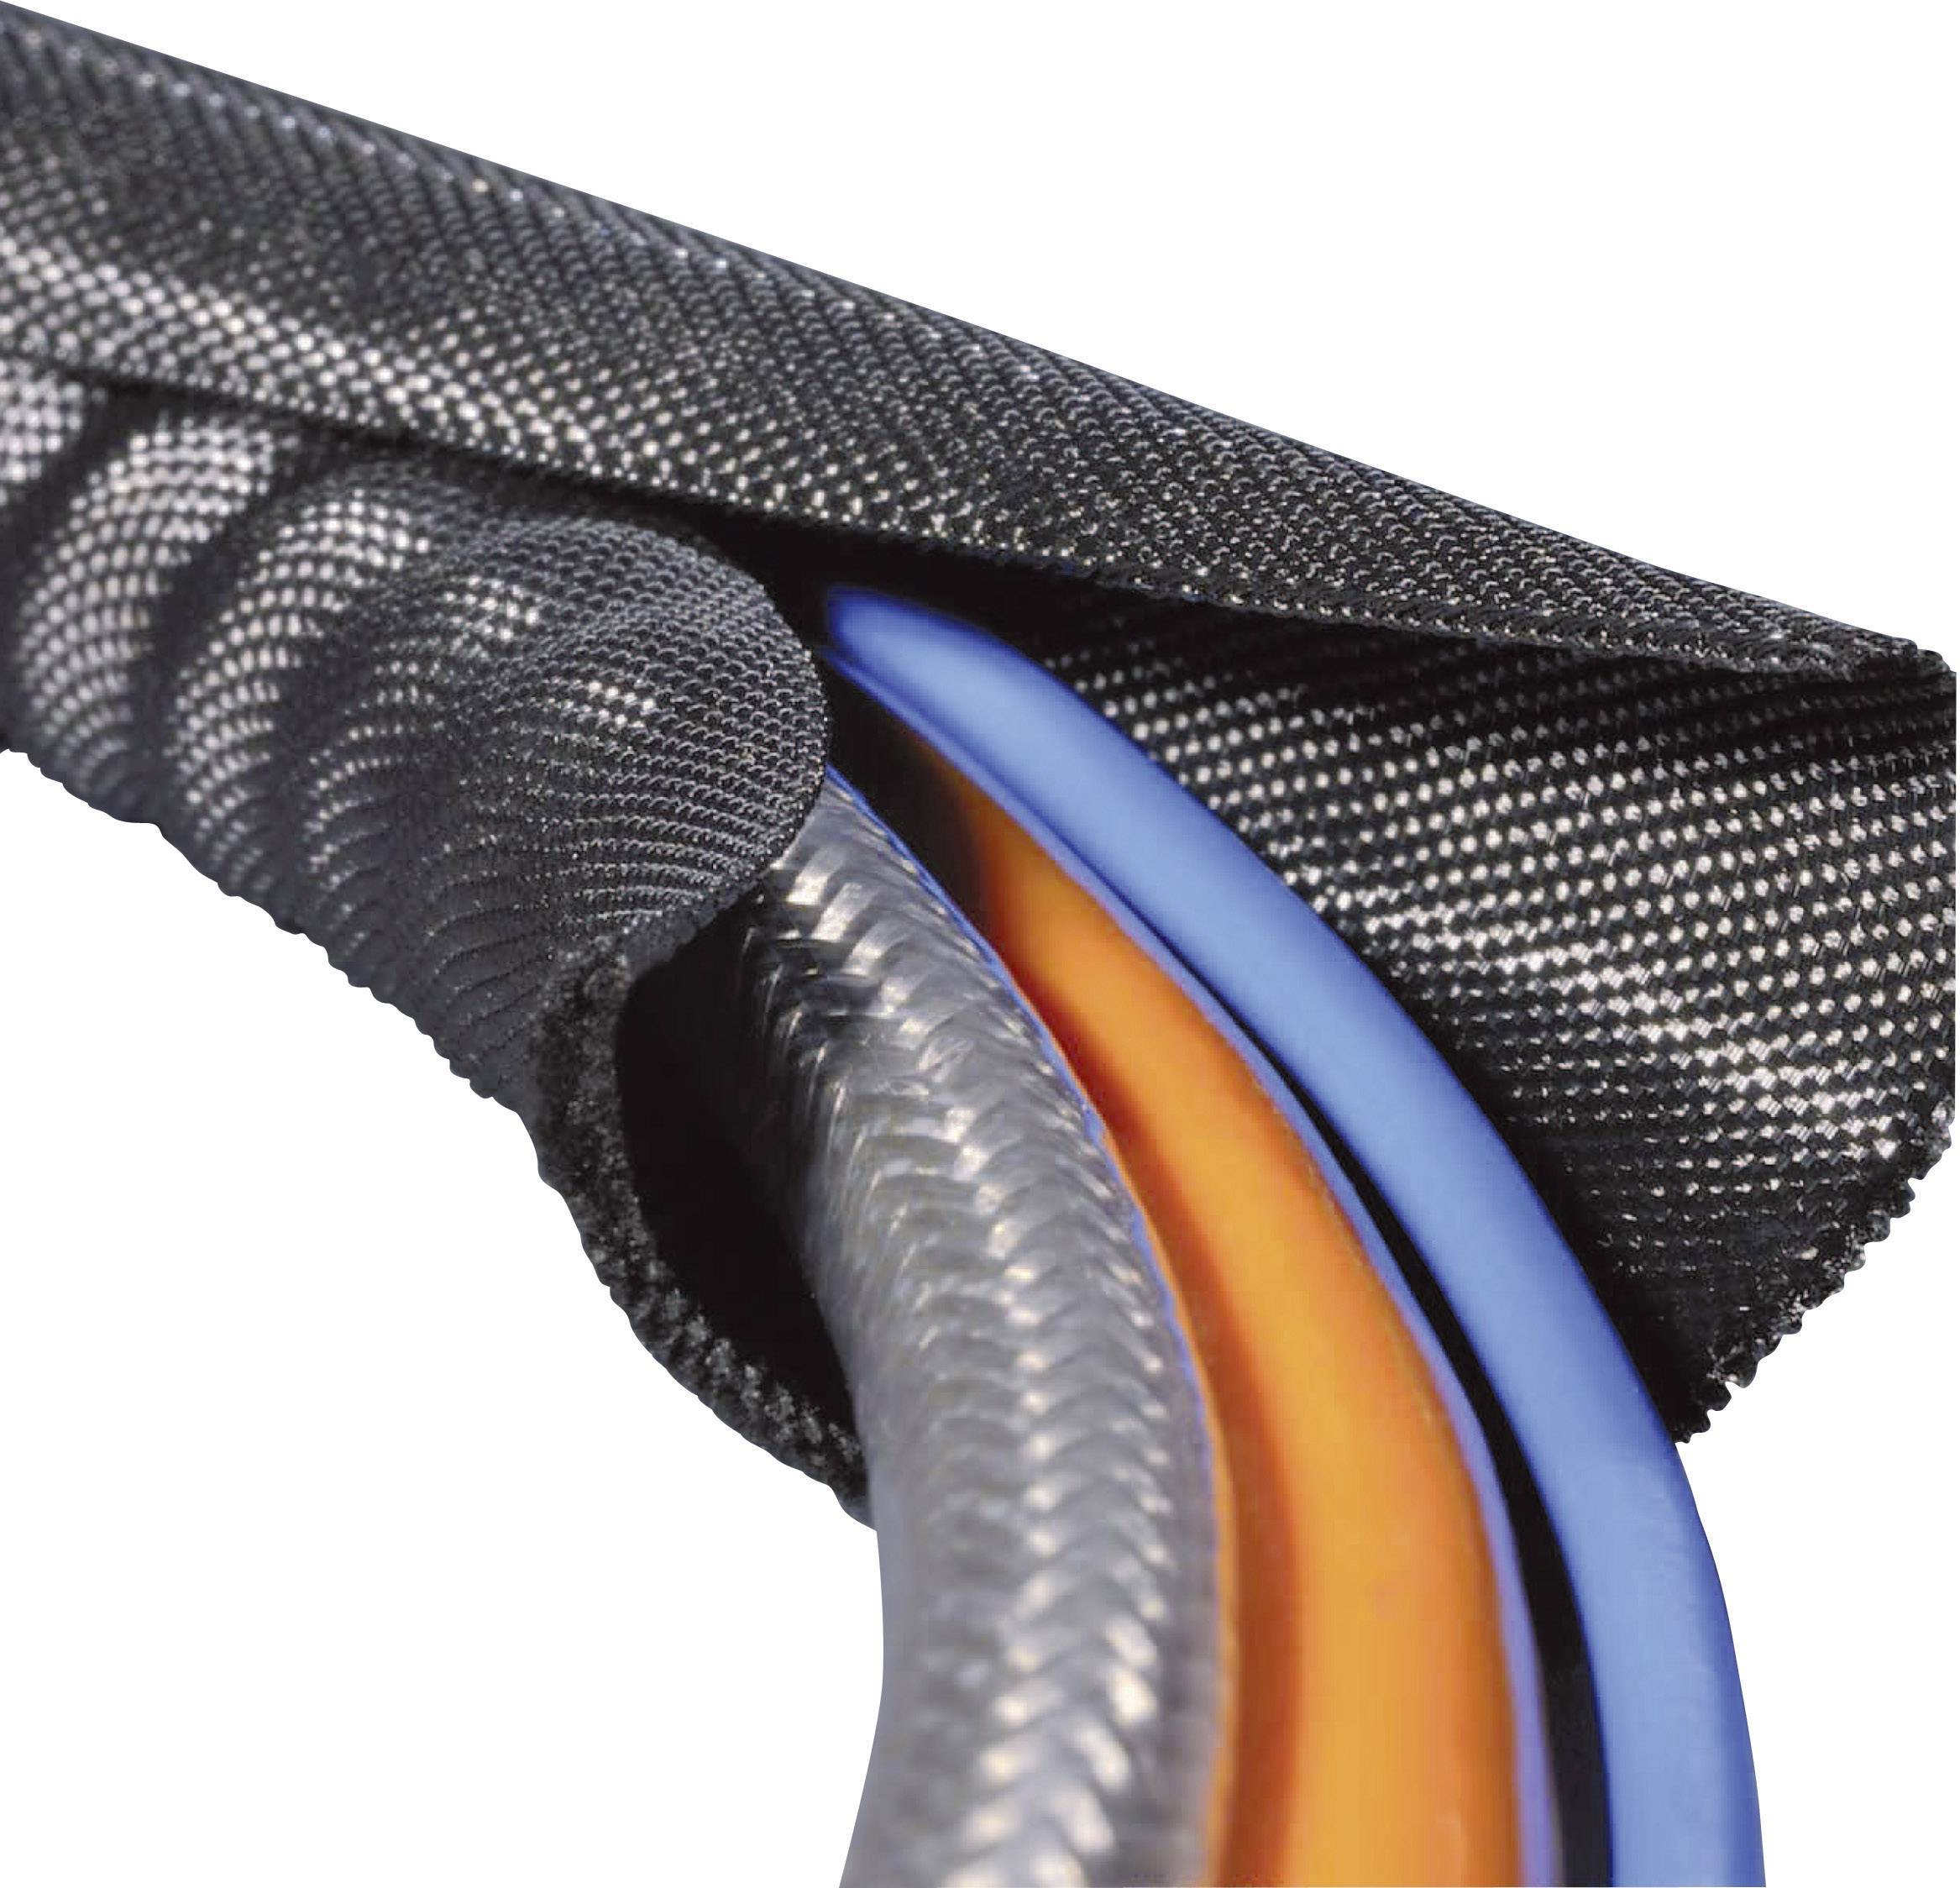 Ochranný oplet HellermannTyton Twist-In 25 (170-01005), 25 mm, černá